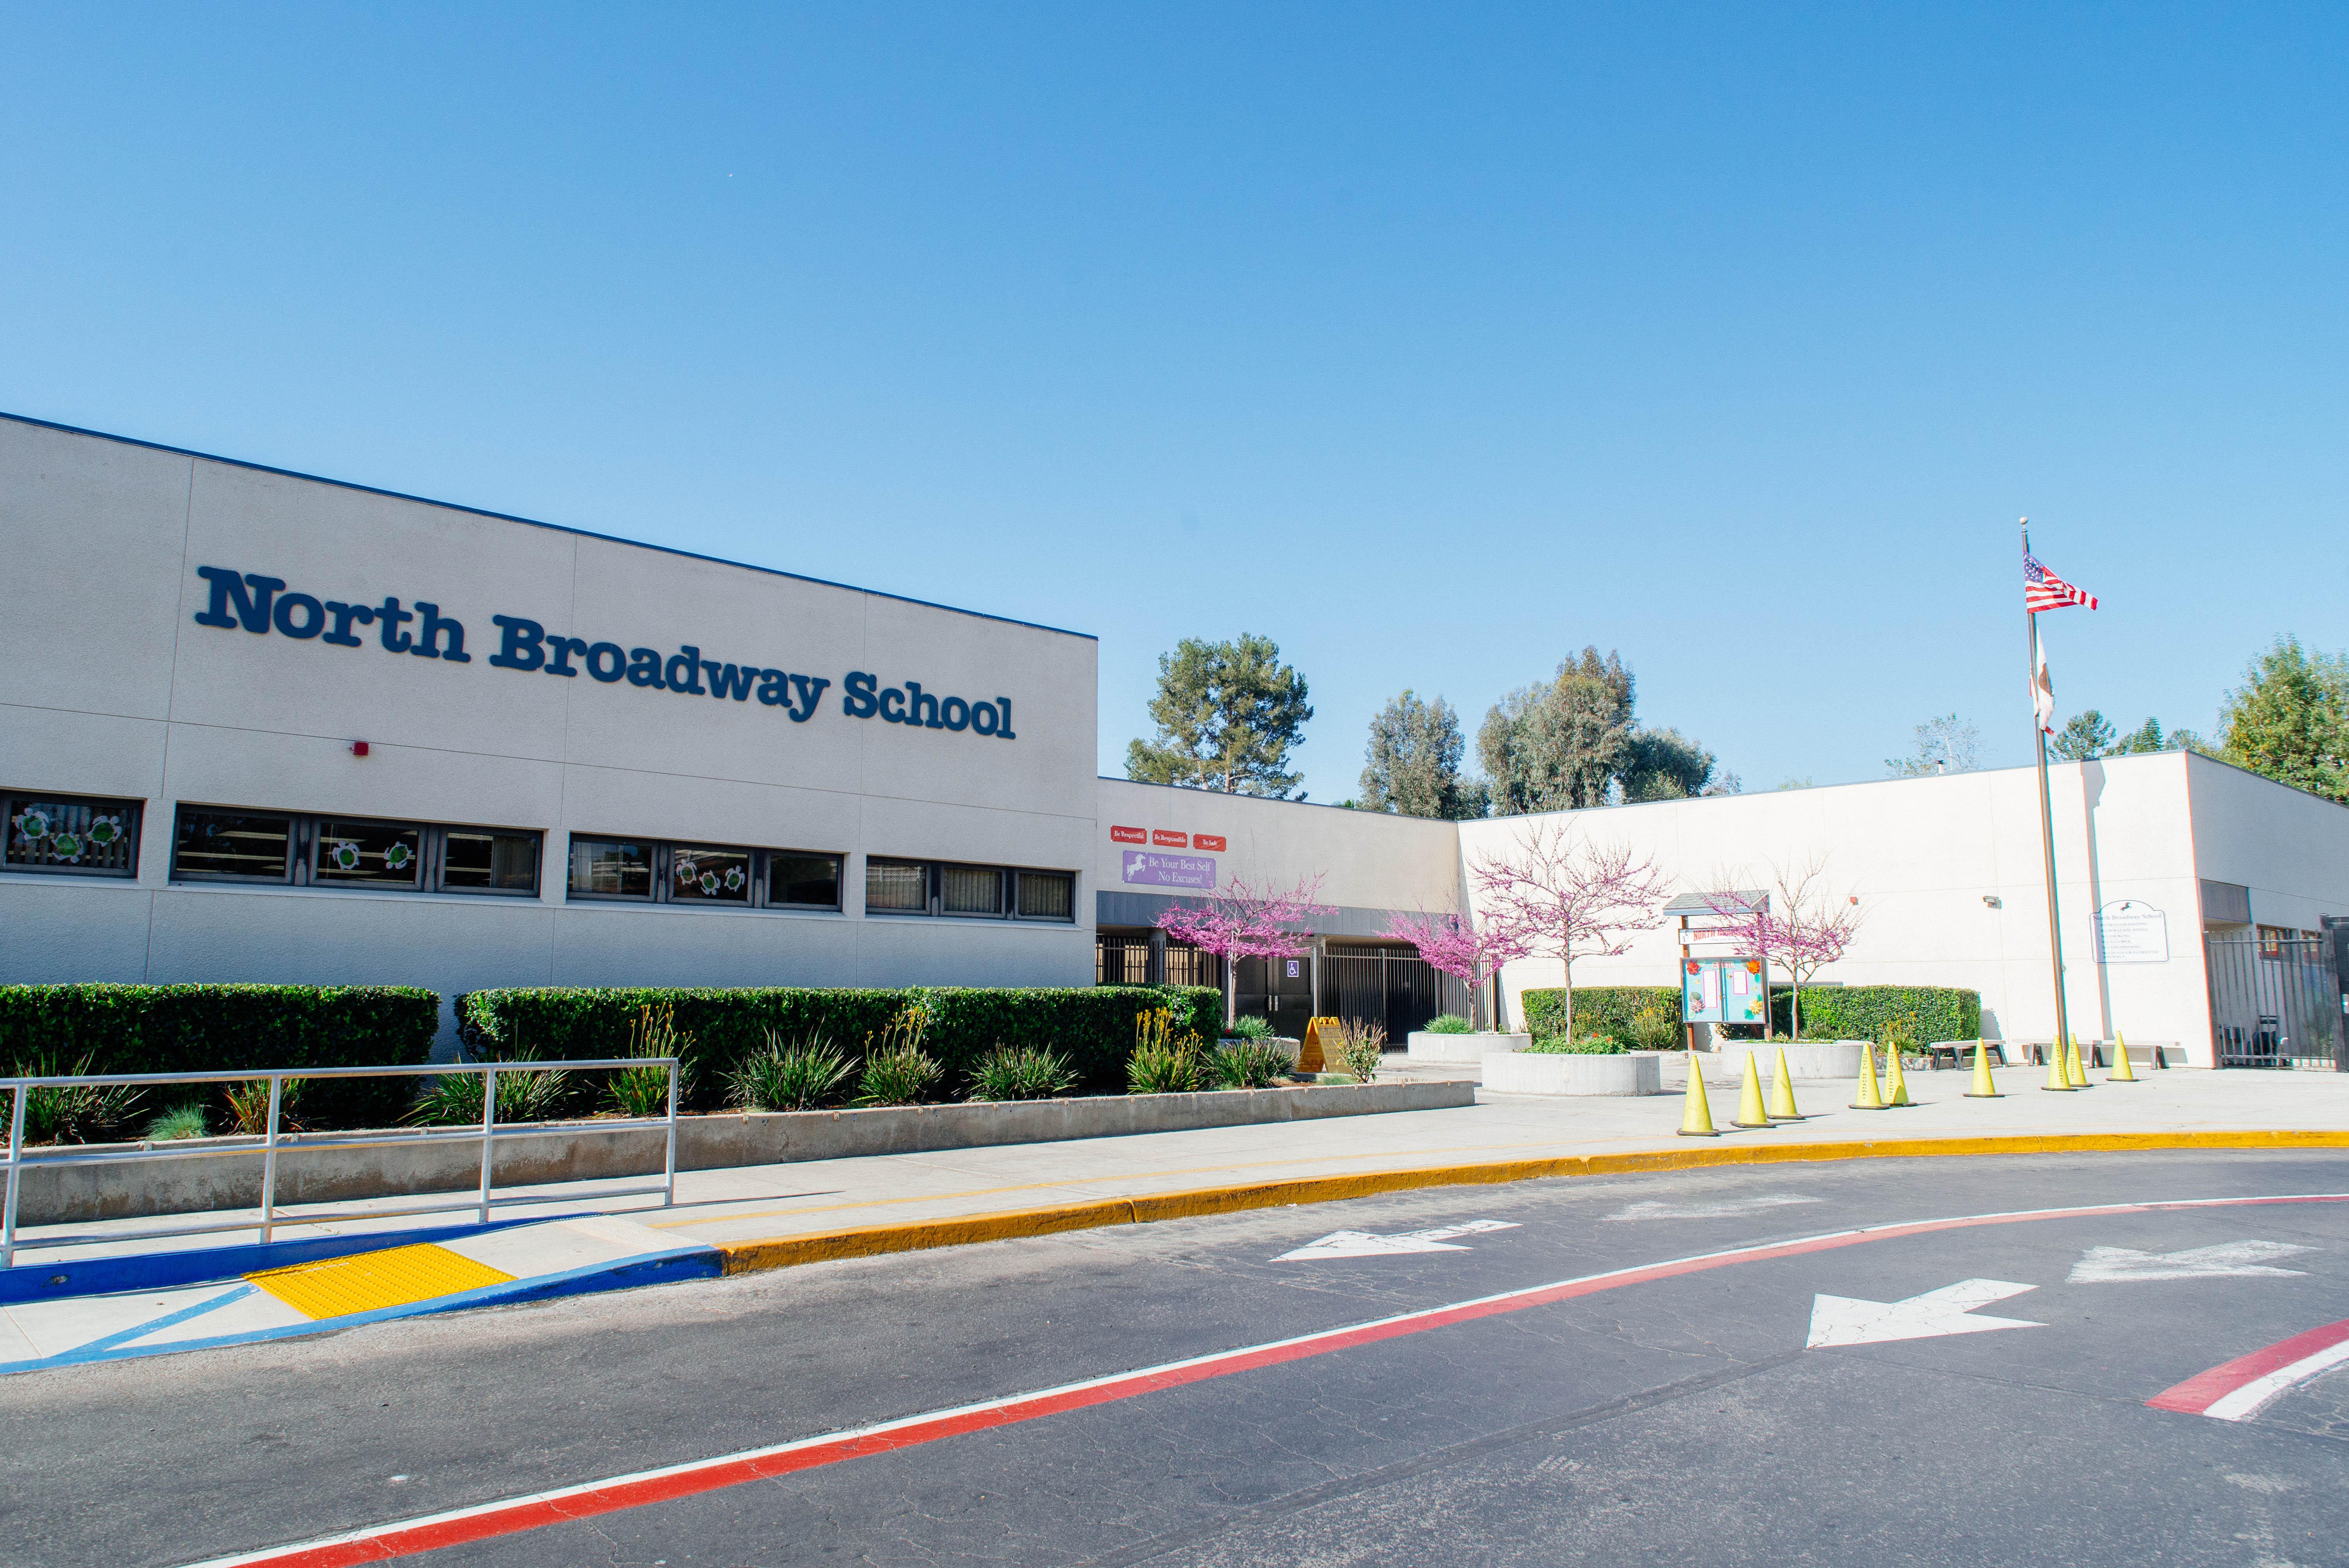 North Broadway Elementary